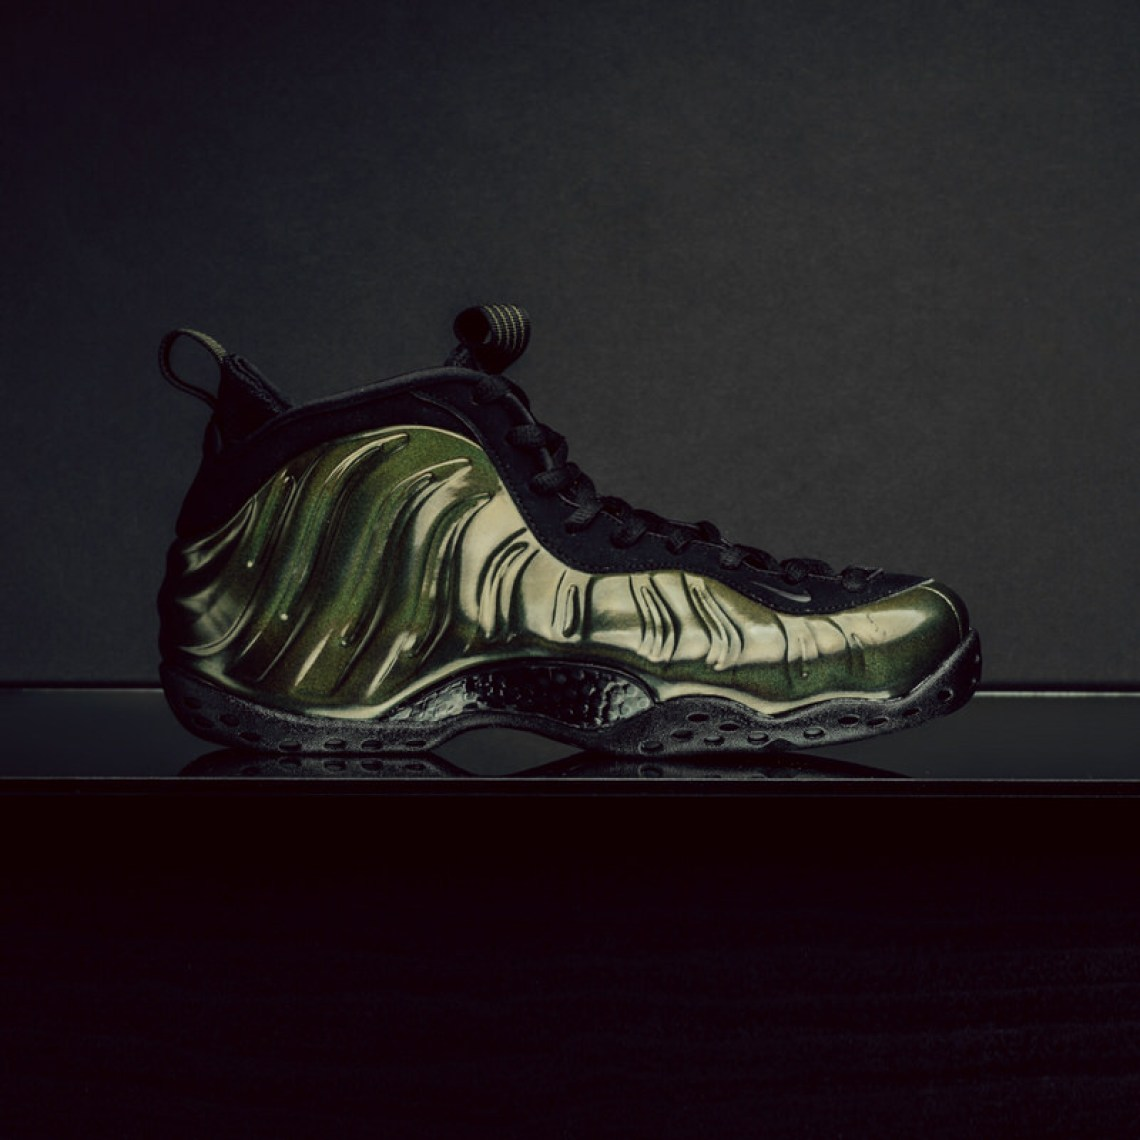 Nike Air Foamposite One Legion Green Available Now Nice Kicks